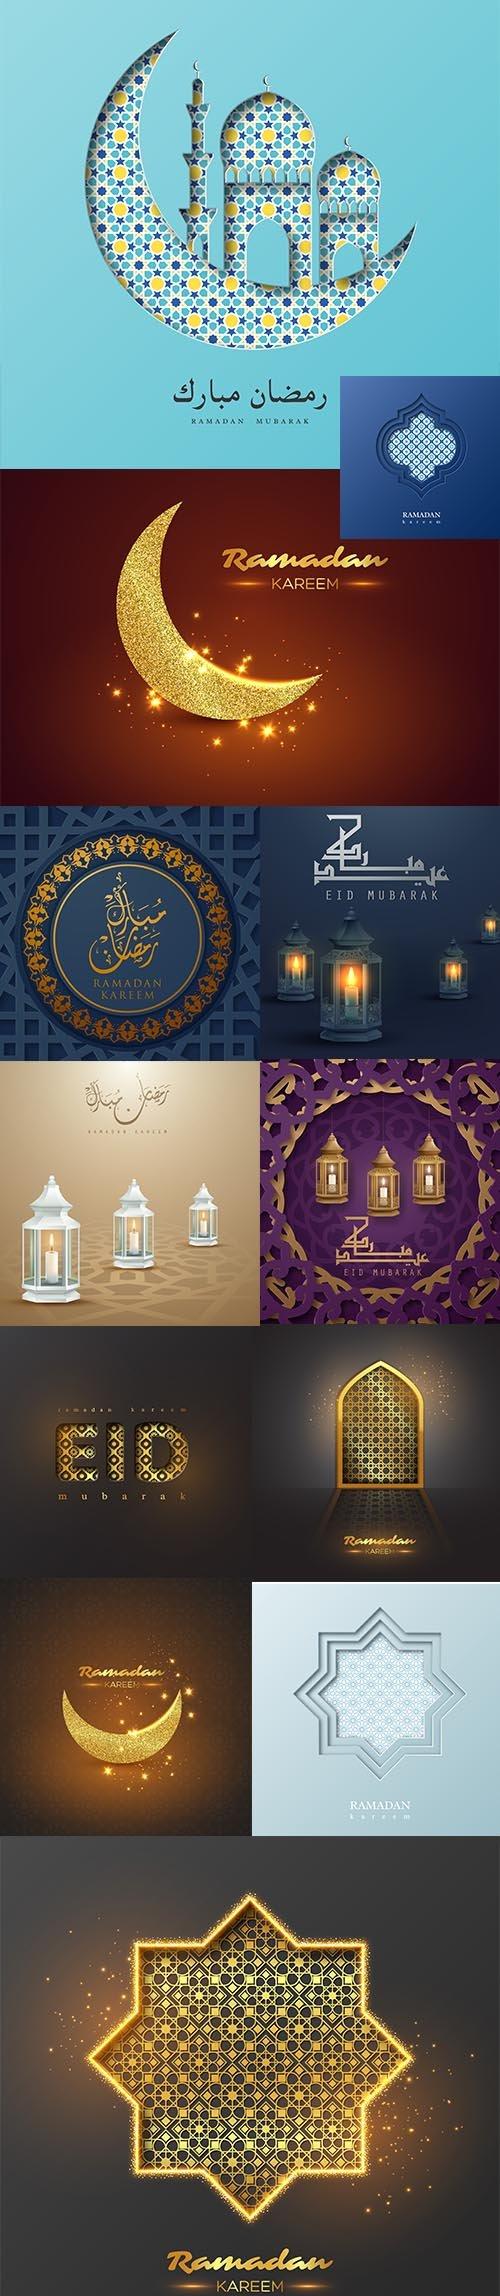 Set of Realistic Beautiful Muslim Illustrations